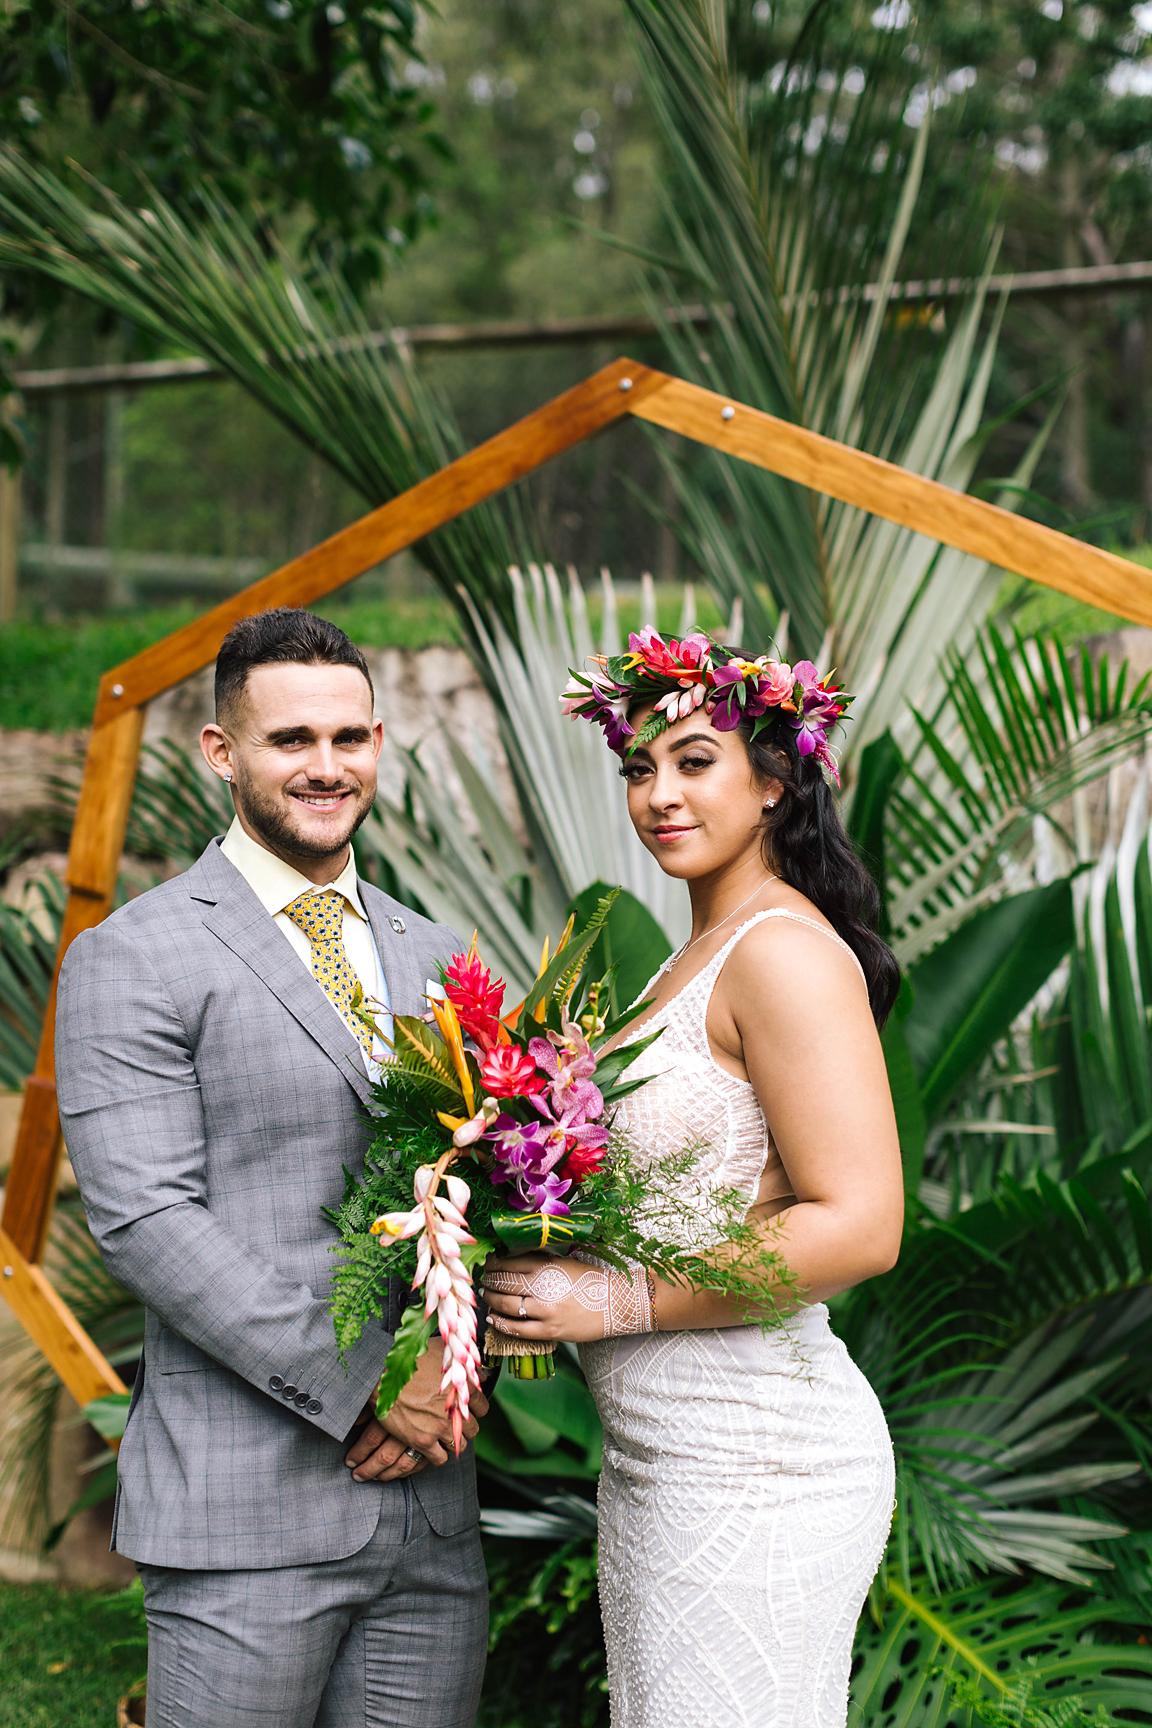 STYLED: HO 'OLAULE 'A | POLYNESIAN WEDDING INSPIRATION GOLD COAST QLD